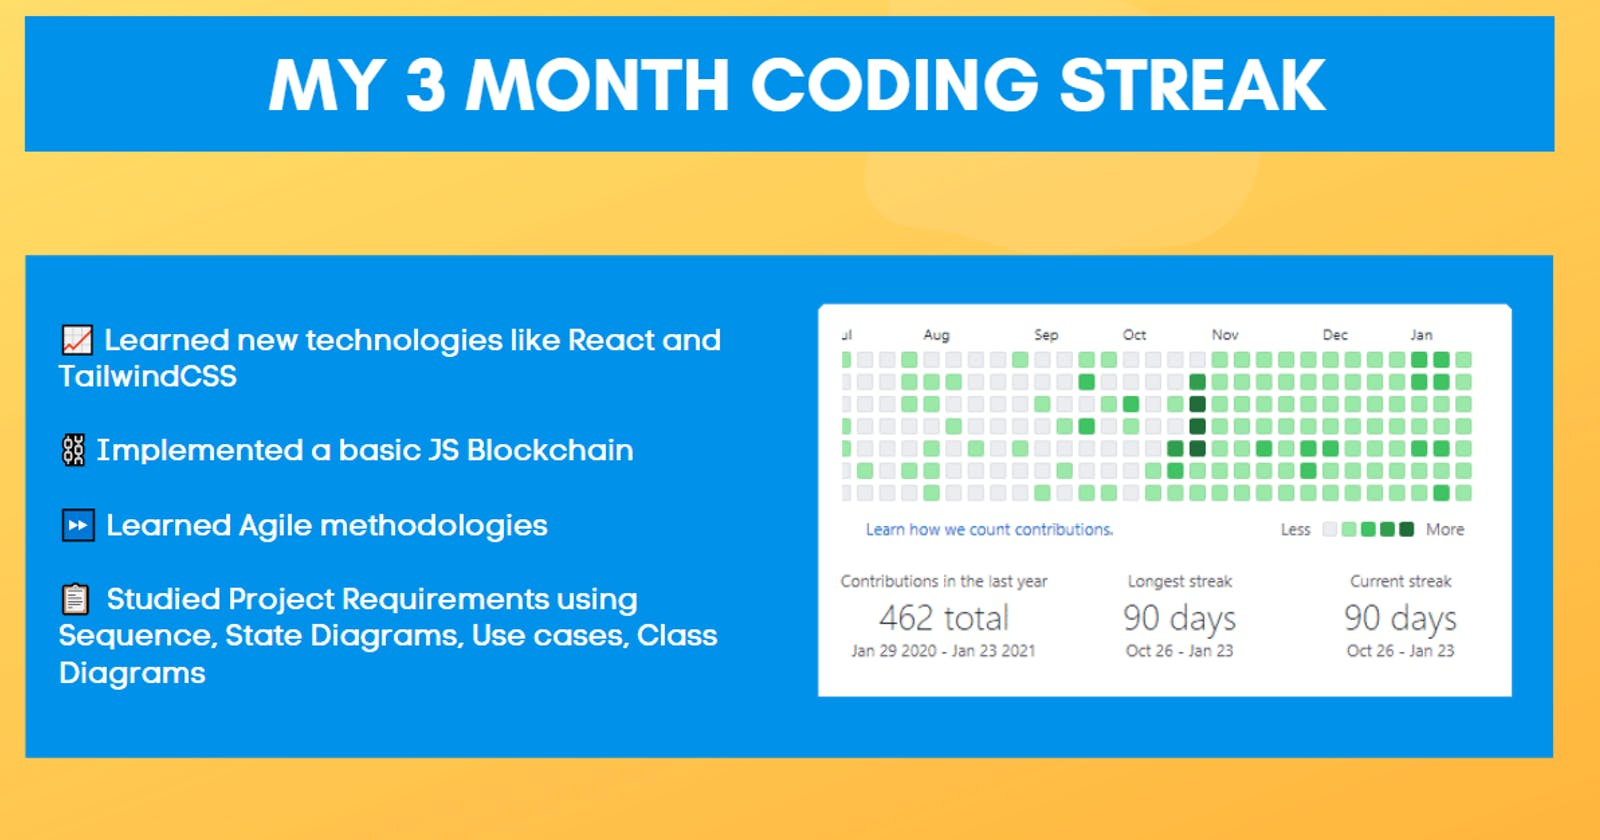 My 3 Month Coding Streak